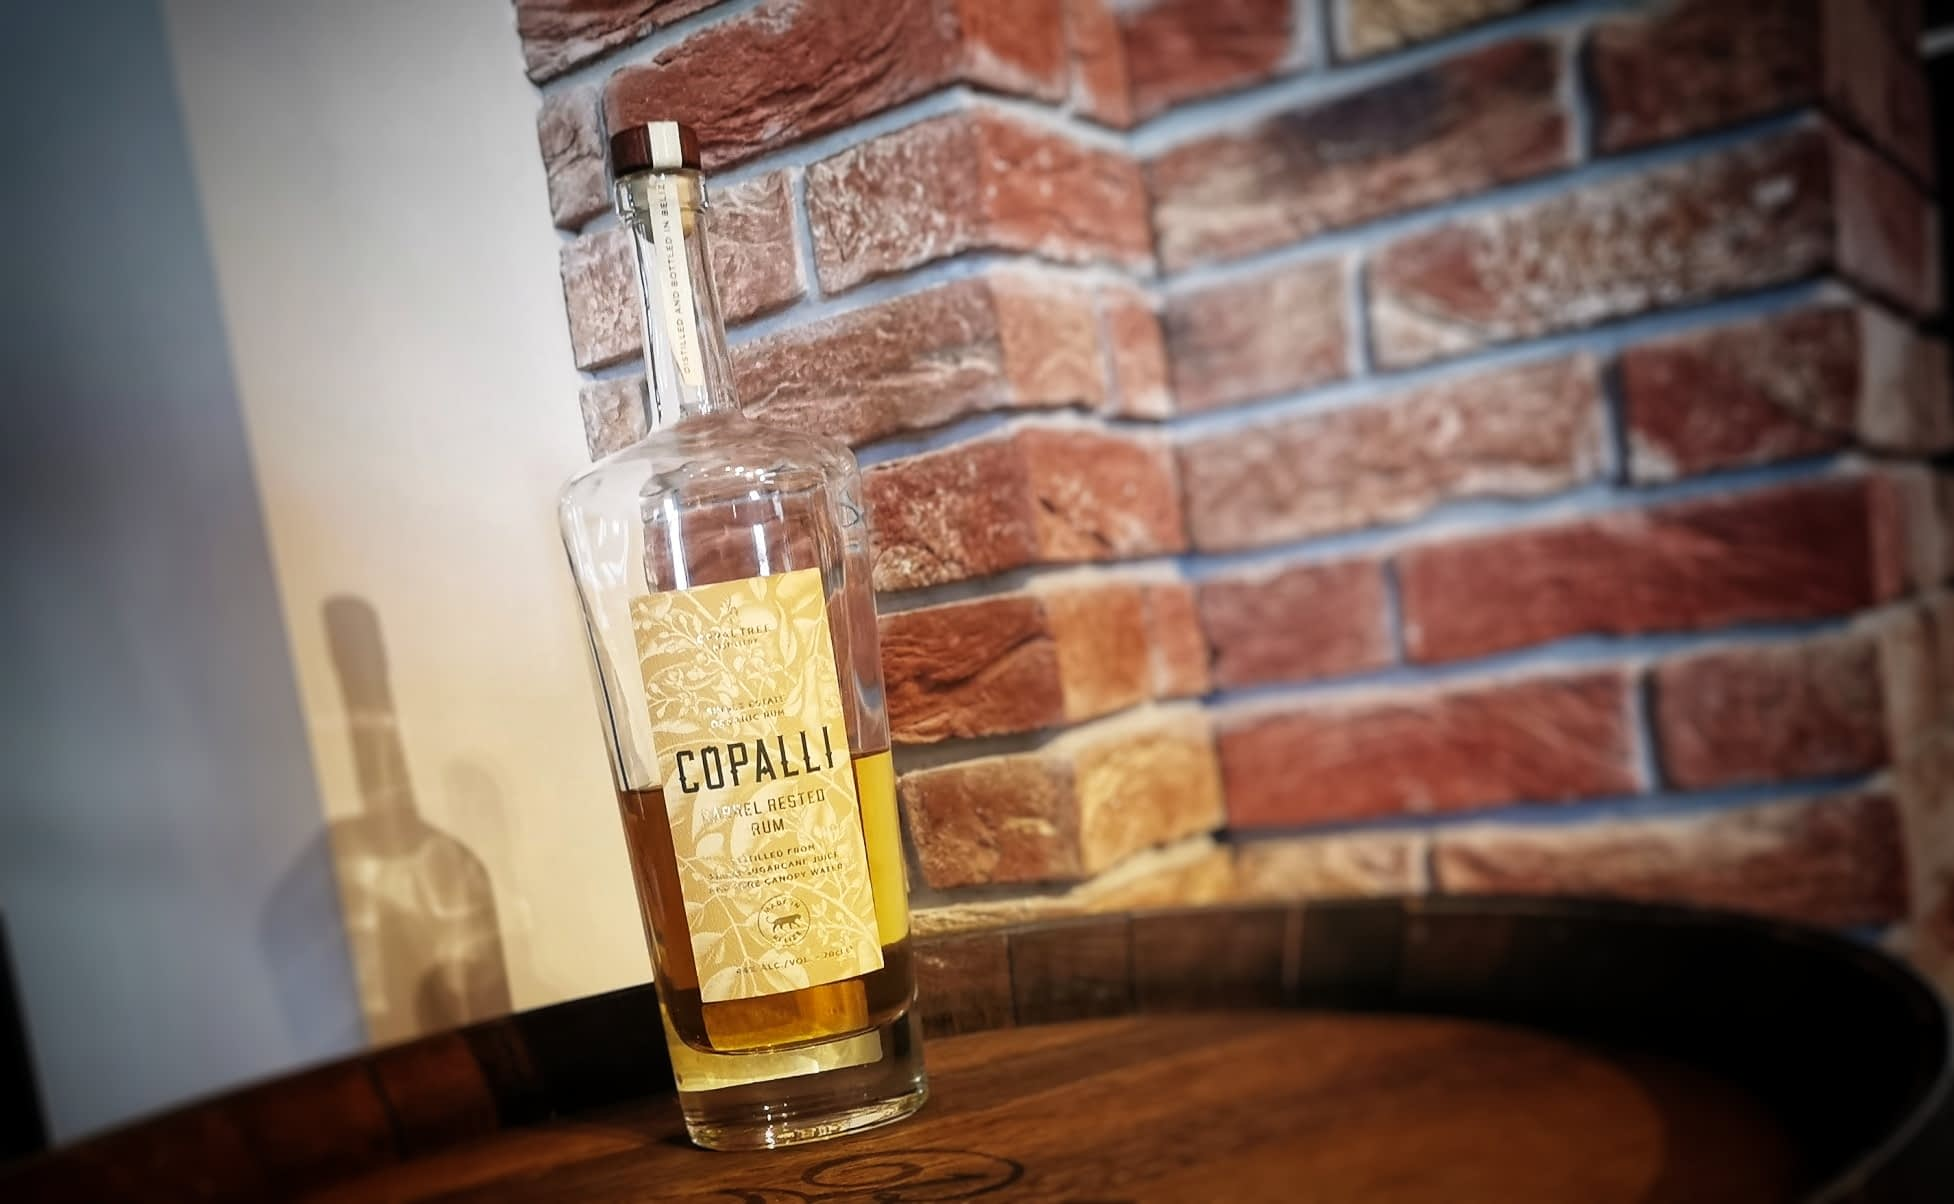 Copalli barrel rested rum – Přímo ze srdce pralesa